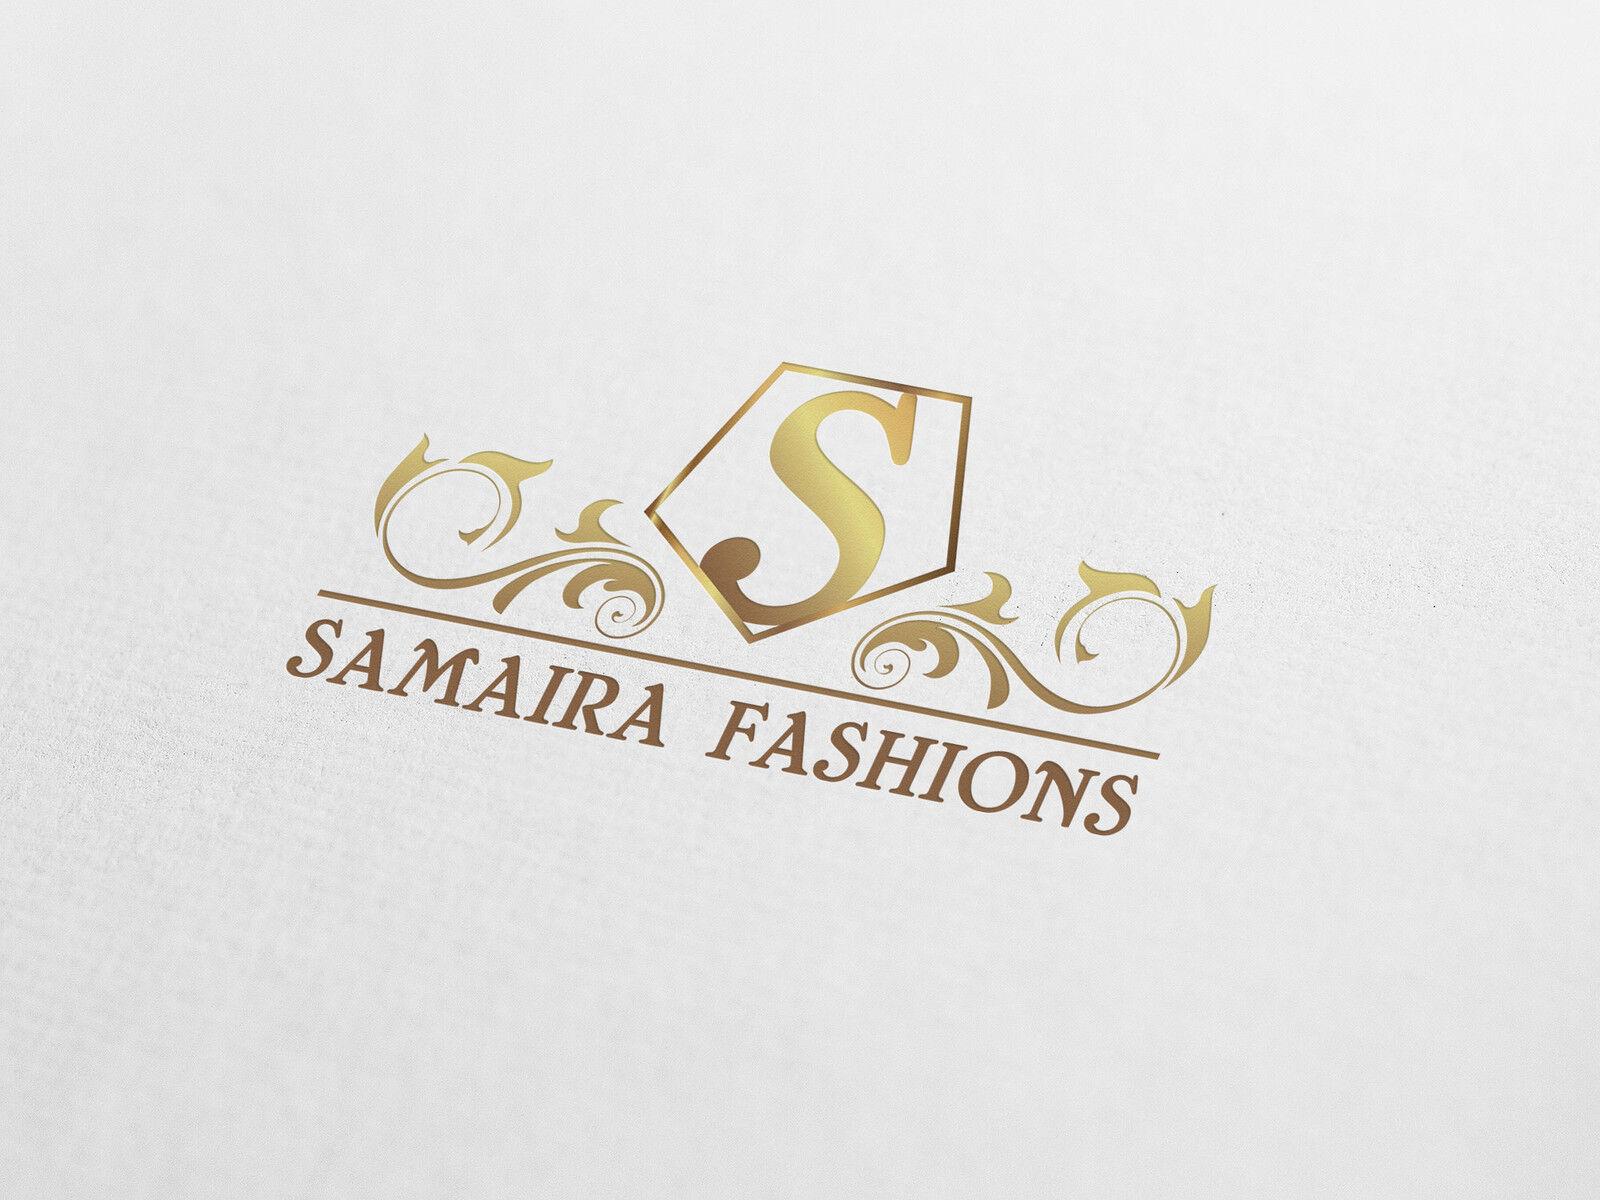 Samaira Fashions